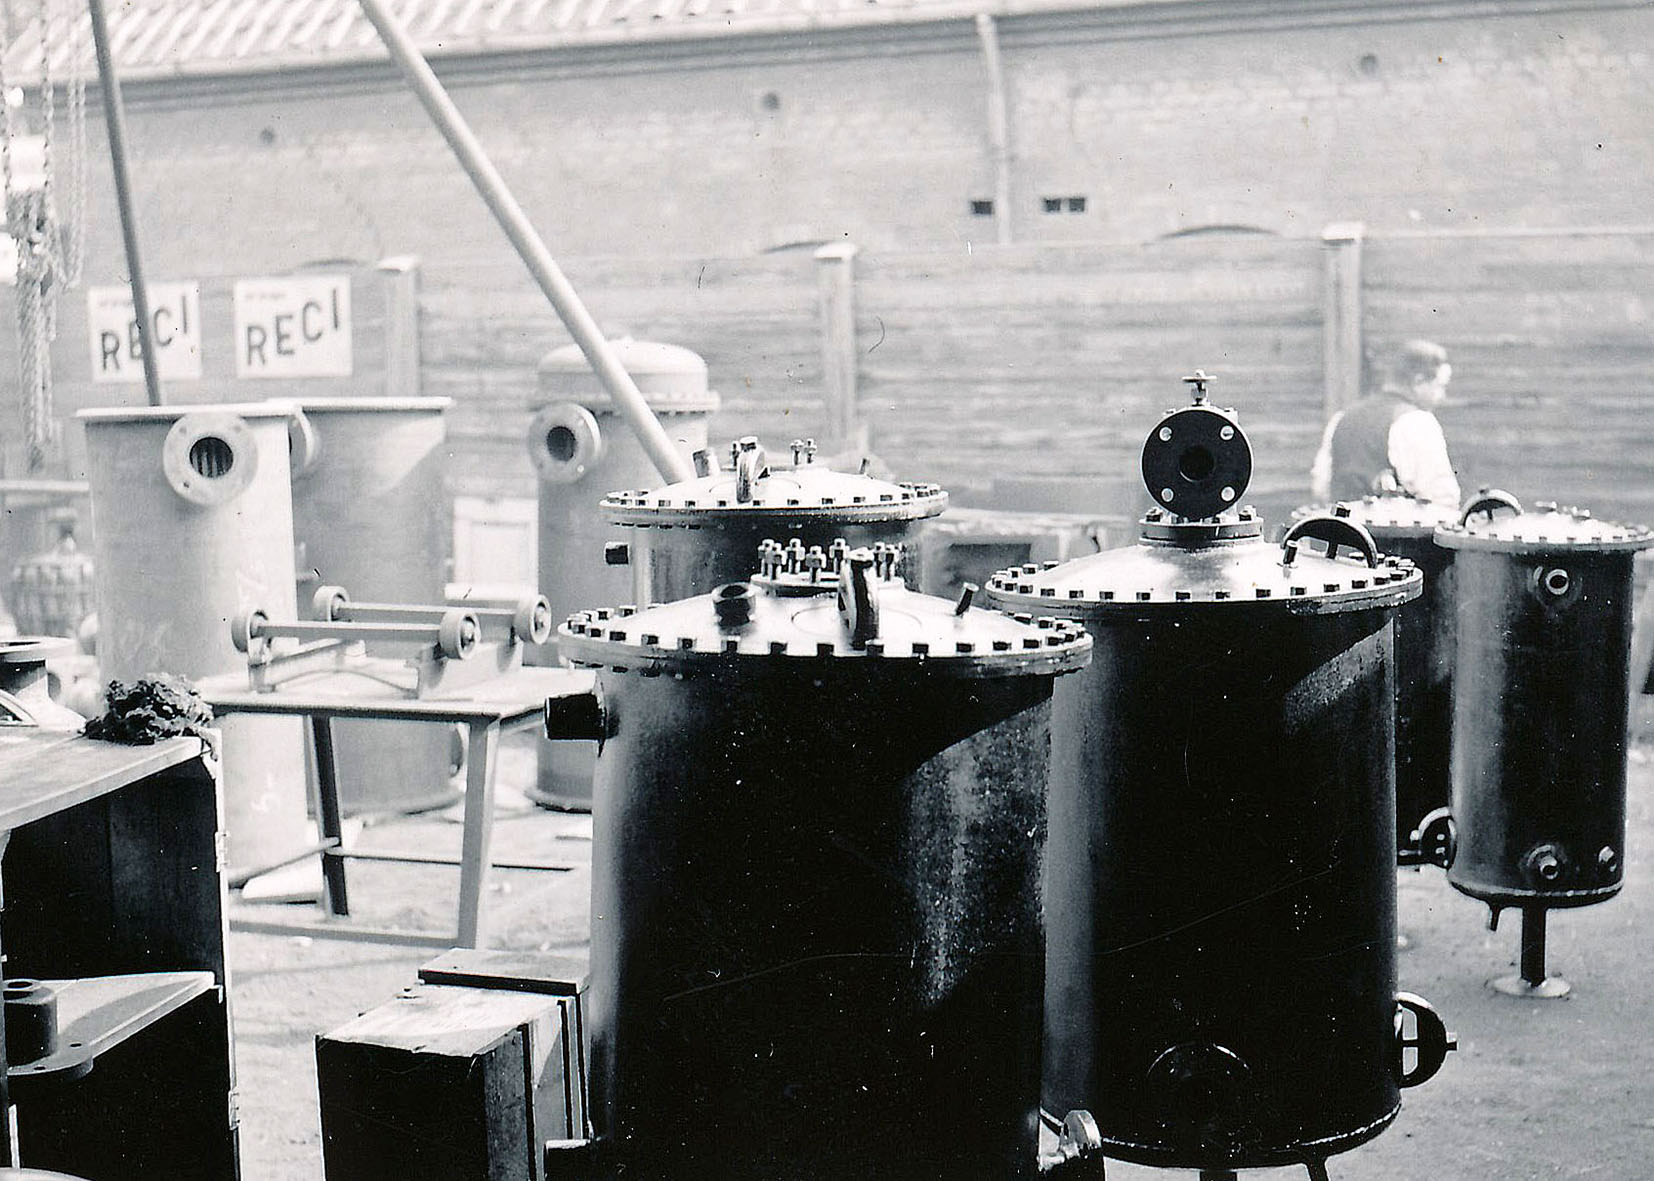 reci-beholdere-ca.-1935